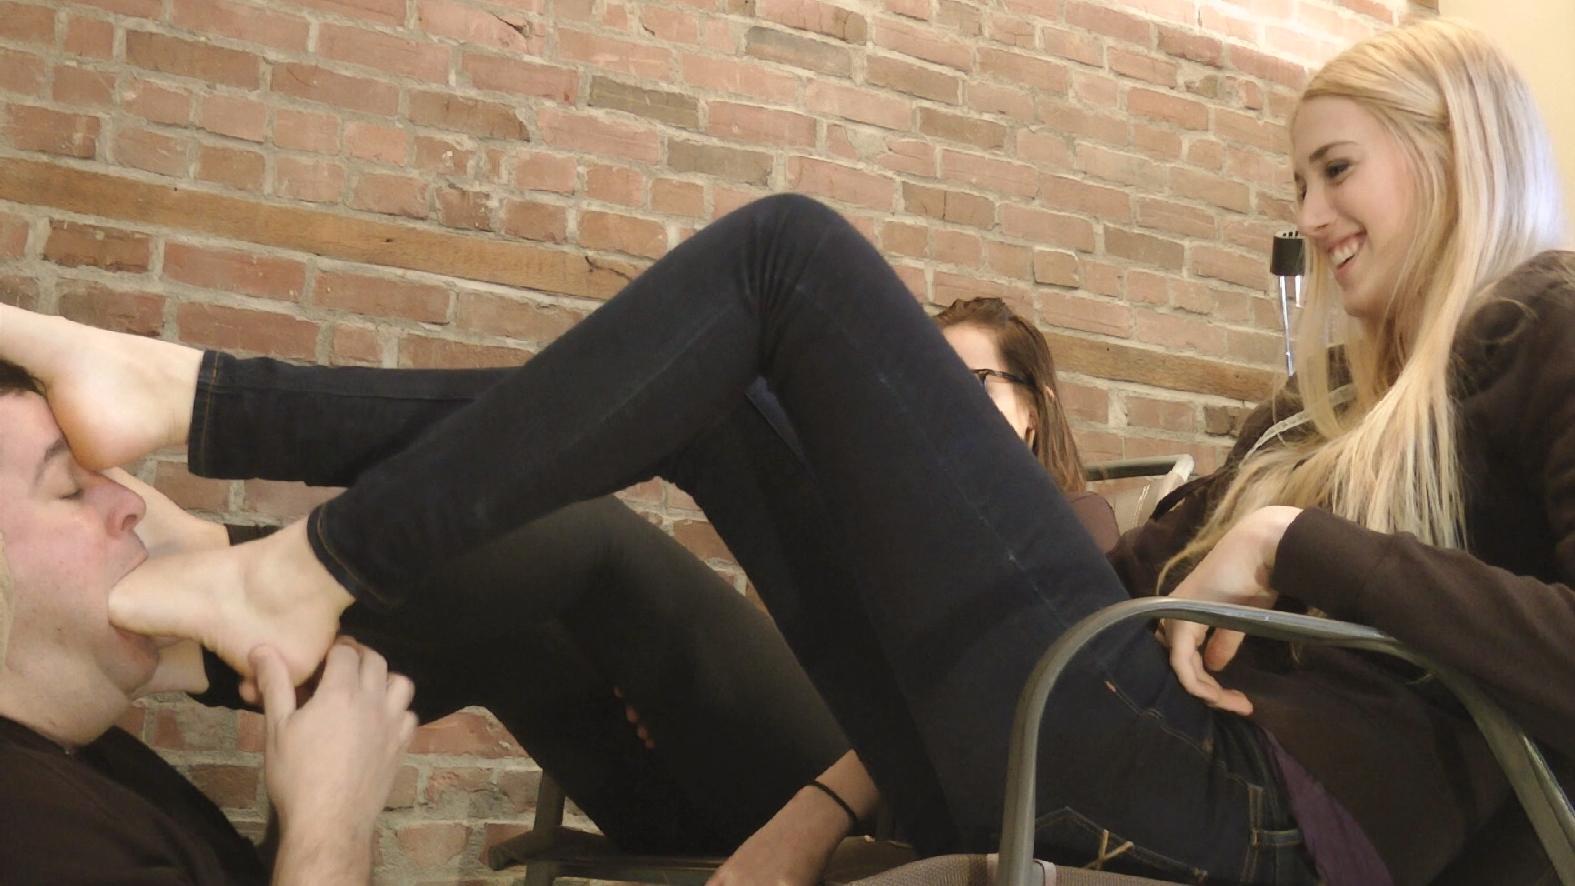 Dreamgirls in Socks on Twitter: Jordan & Presleys First